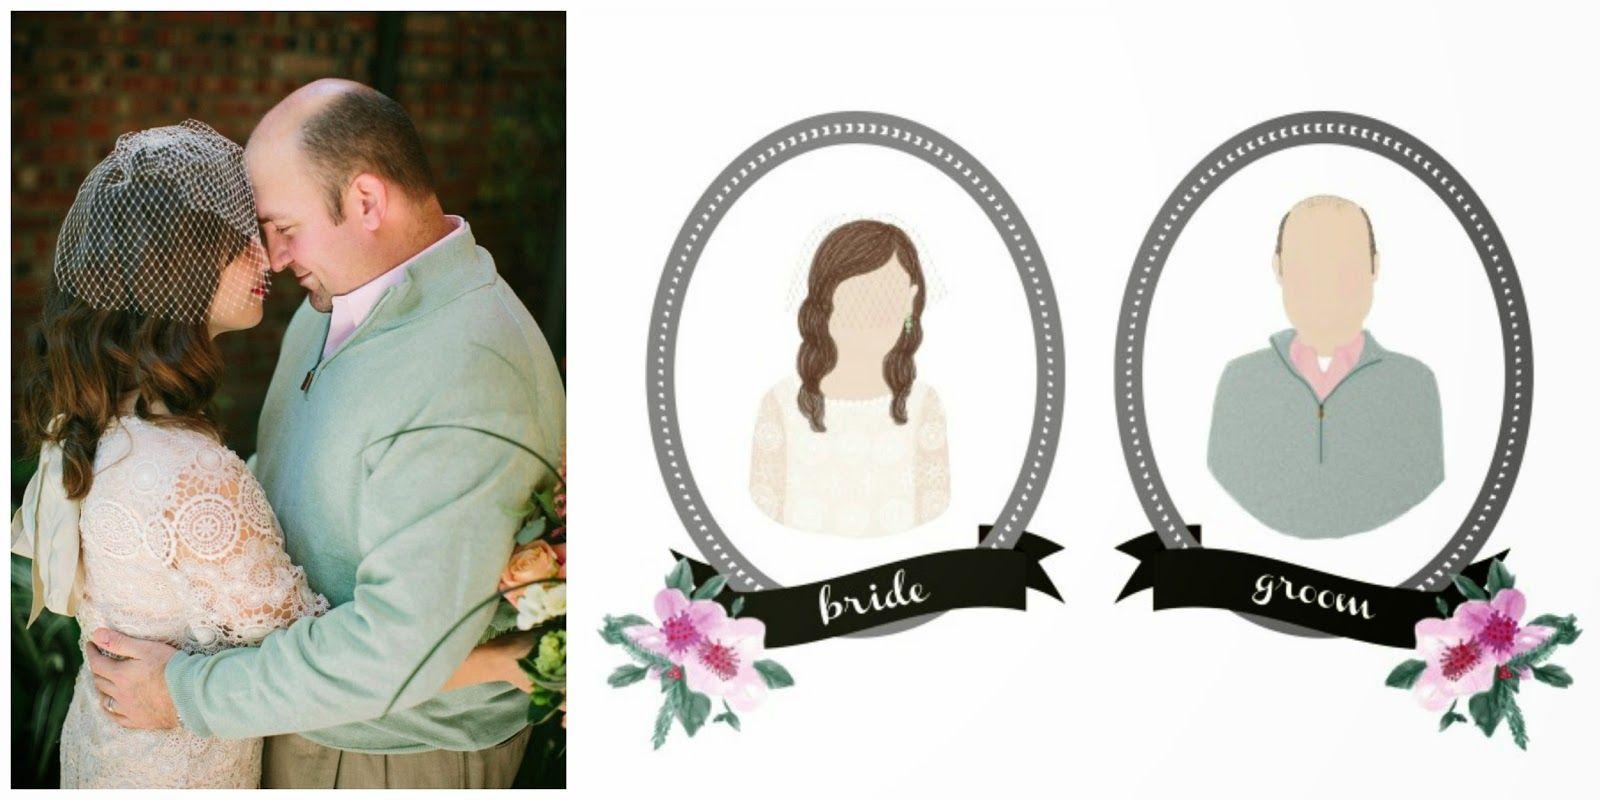 Great Wedding Gift Idea; http://www.greetingsfromtx.com/2014/04/my-favorite-artist.html